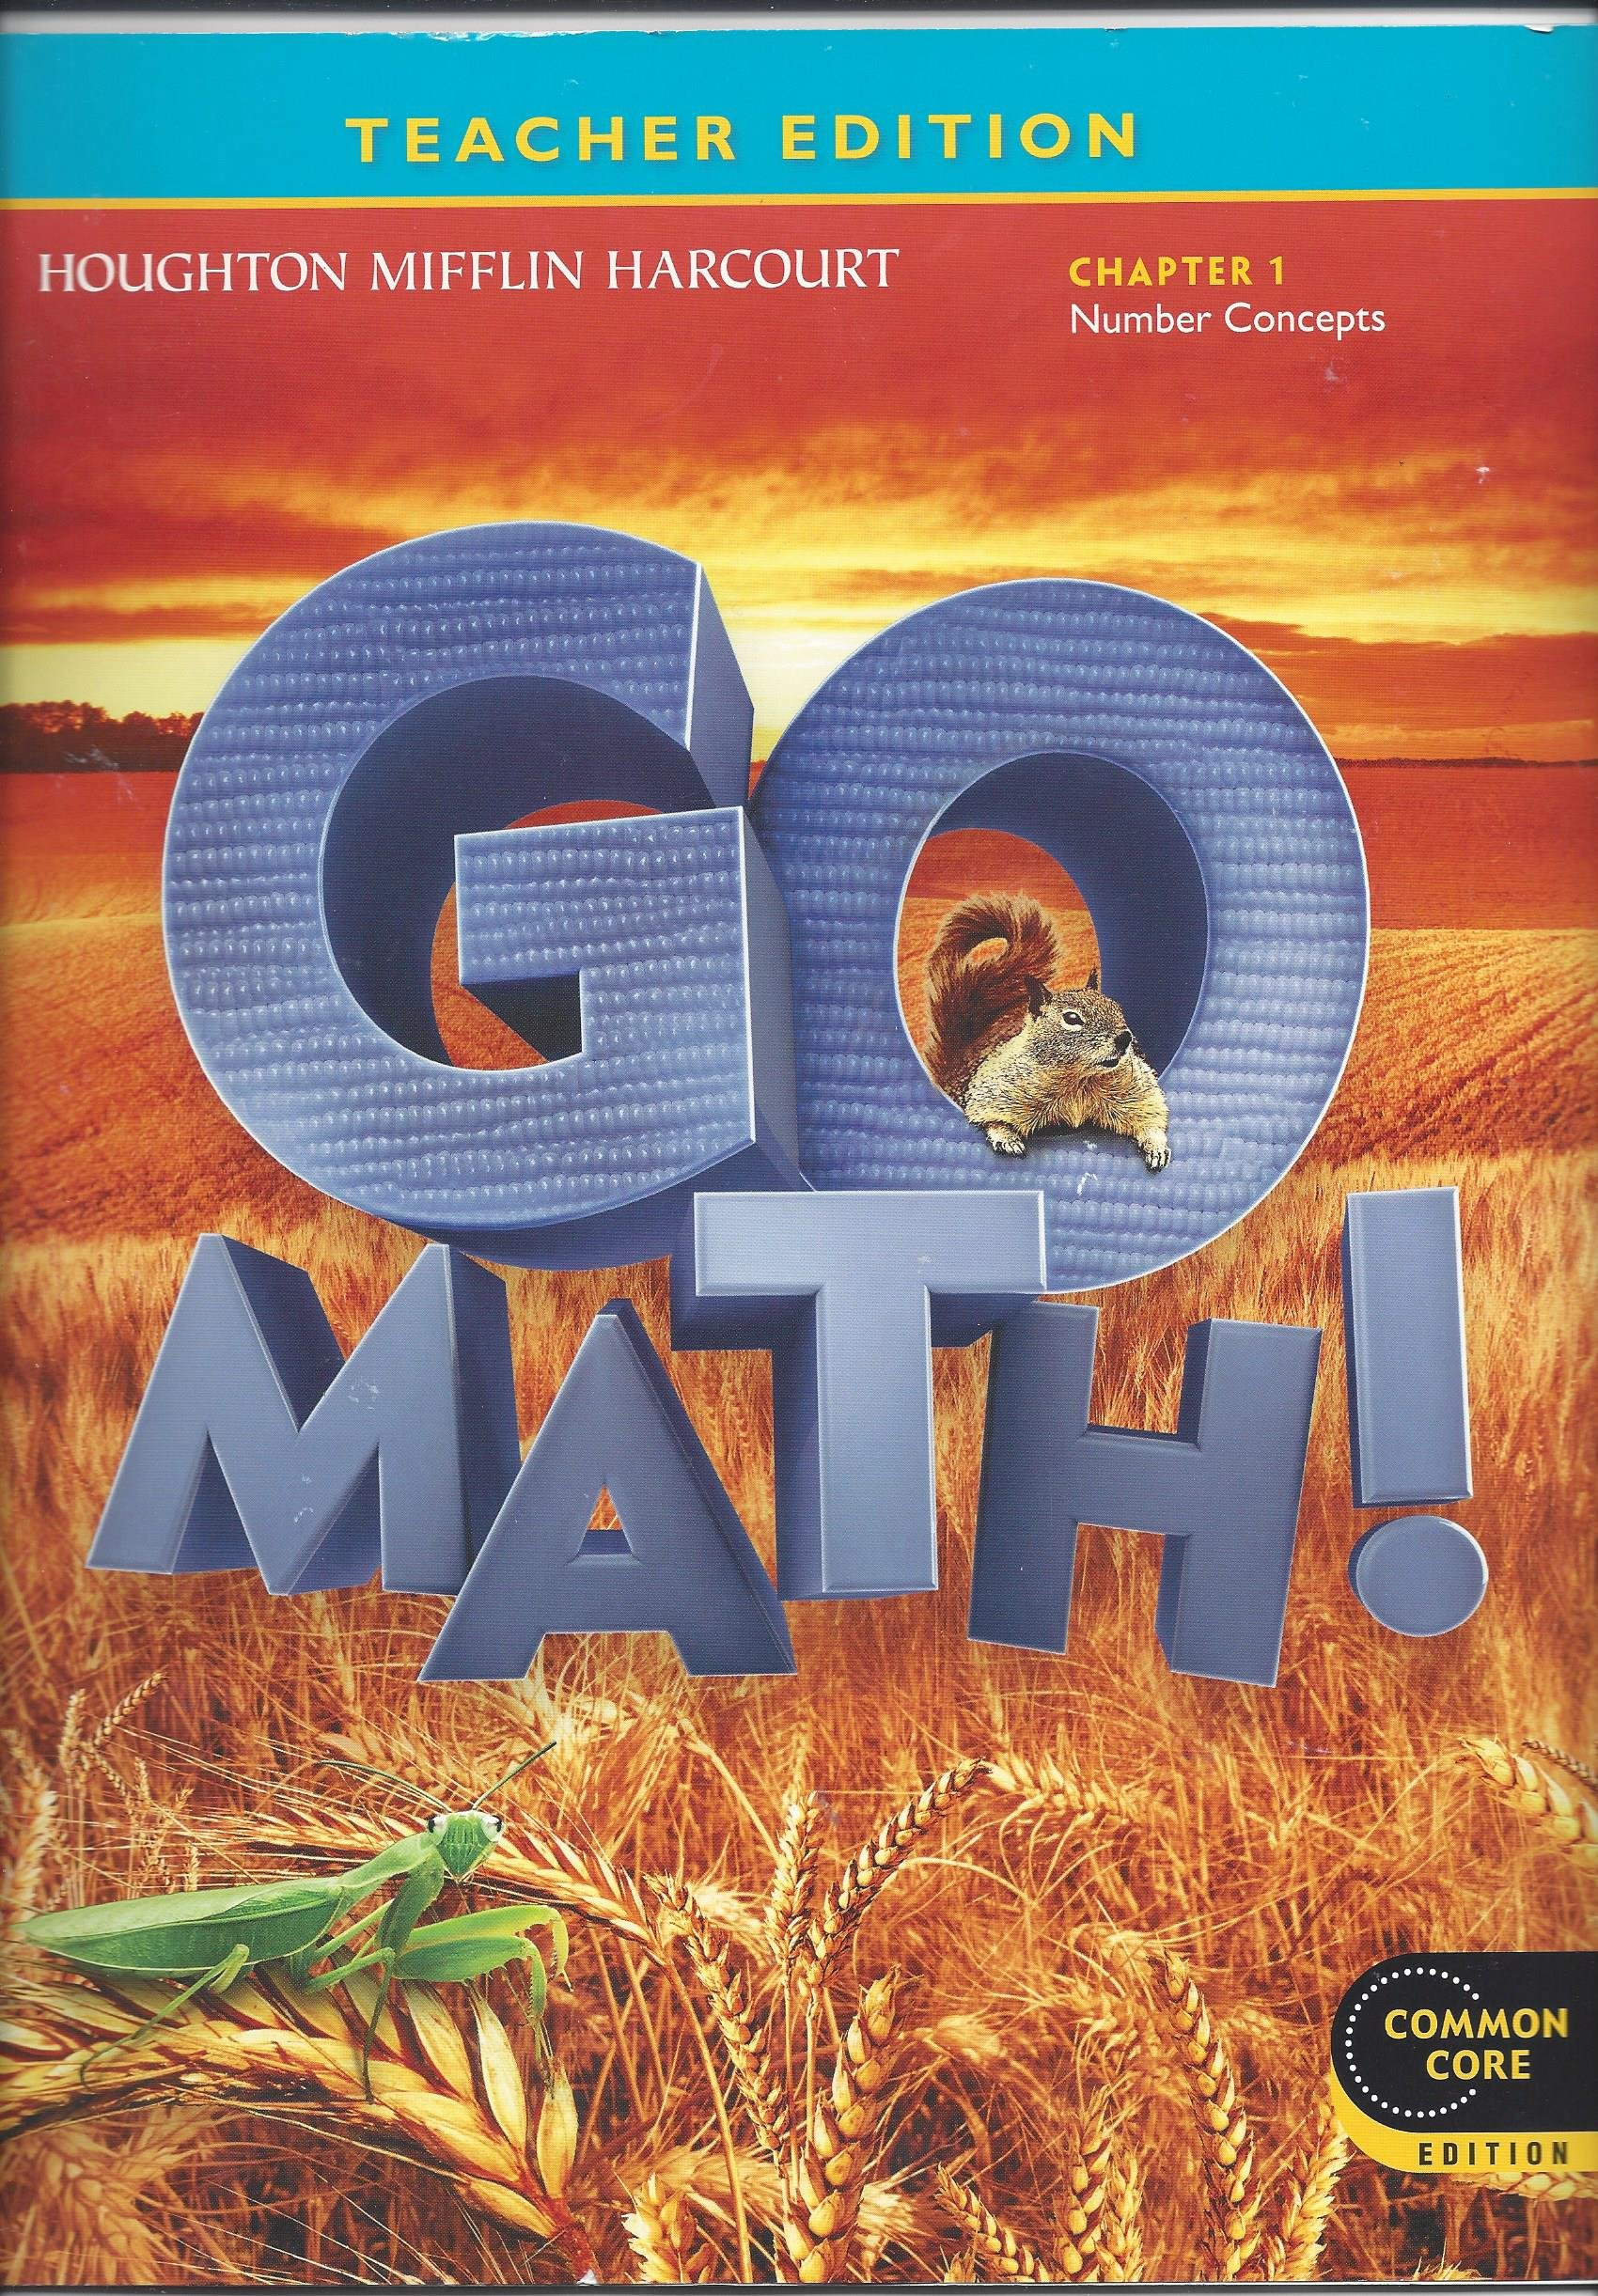 Teacher Edition Go Math 2nd Grade Chapter 1 Number Concepts